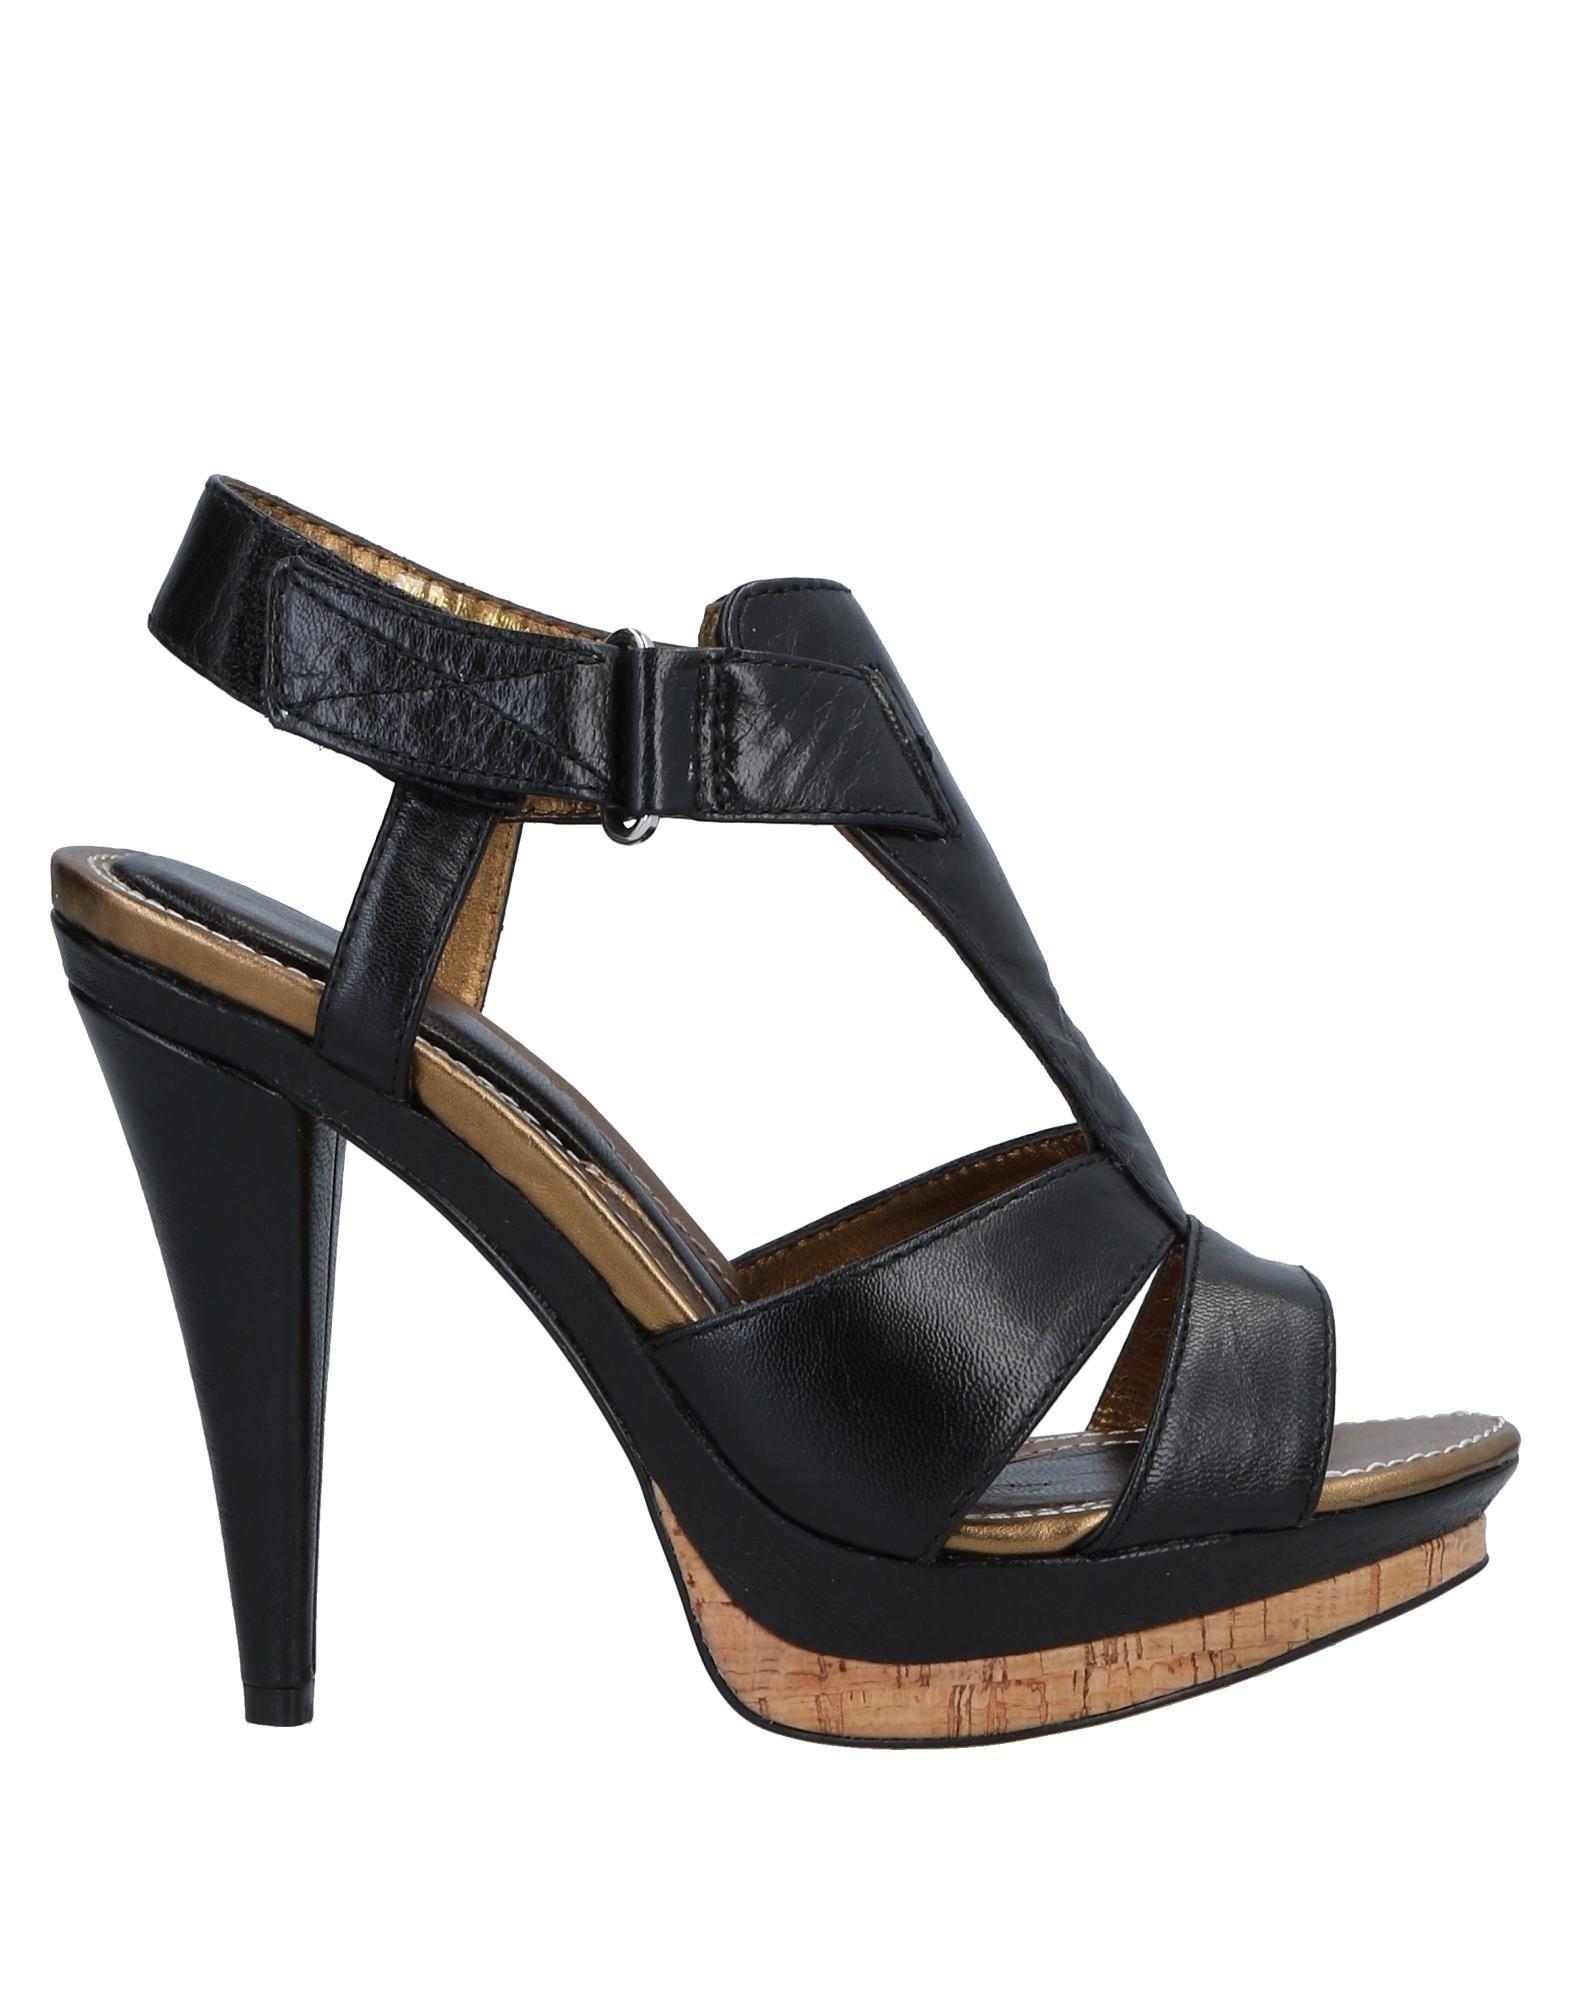 Cafènoir Cafènoir Cafènoir Sandals - Women Cafènoir Sandals online on  United Kingdom - 11562393EC 0ad190